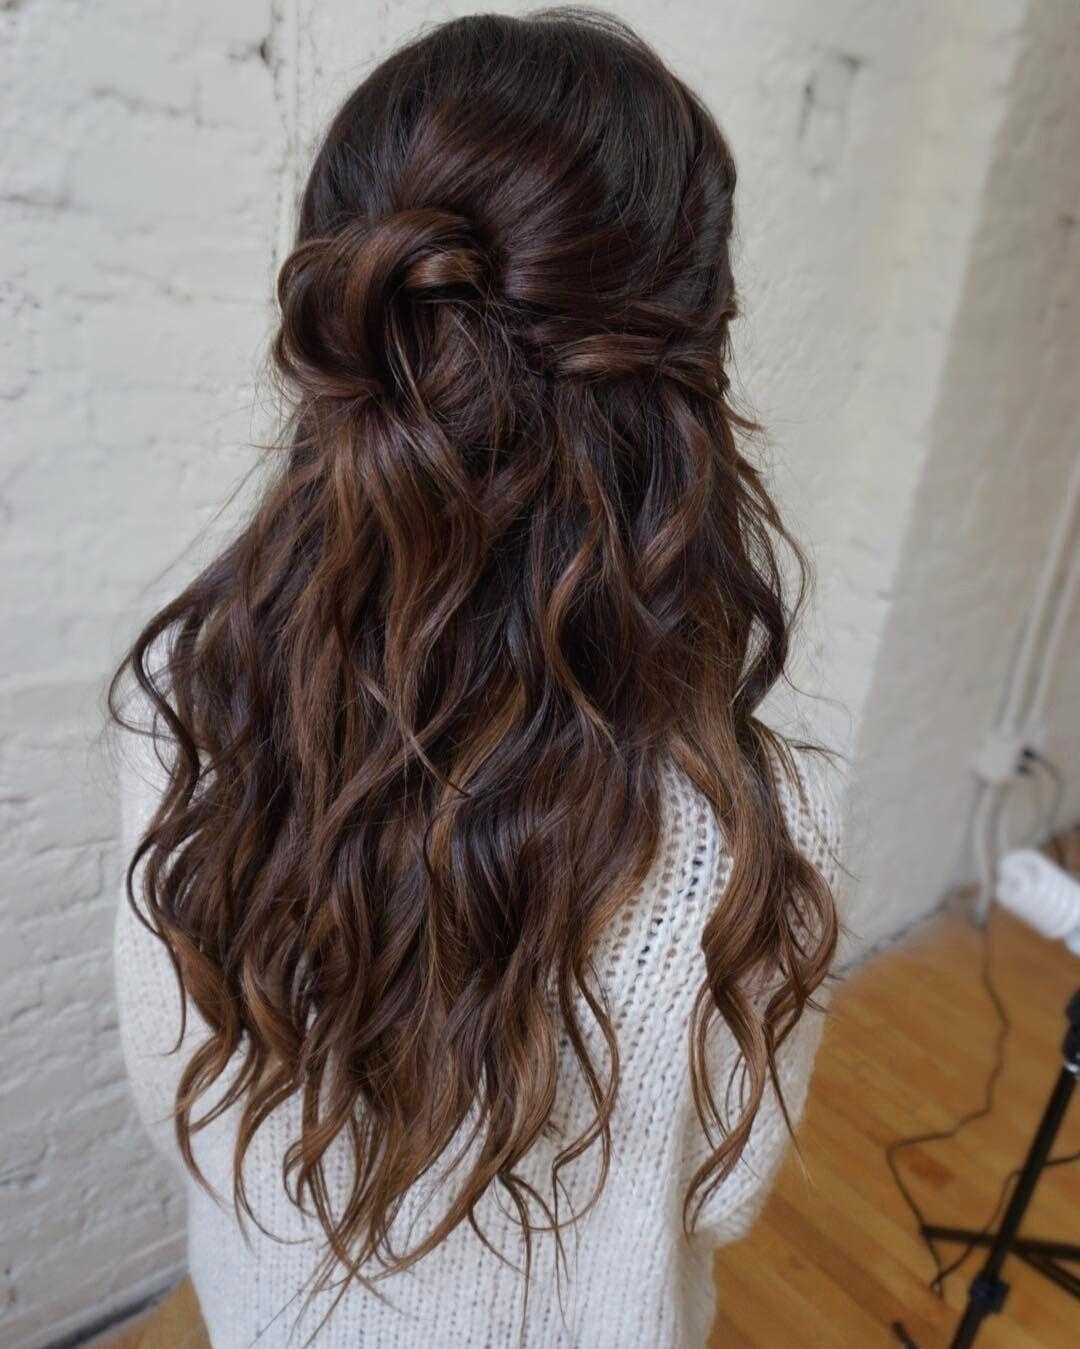 pin by nevena on hair in 2019 | boho wedding hair, wedding